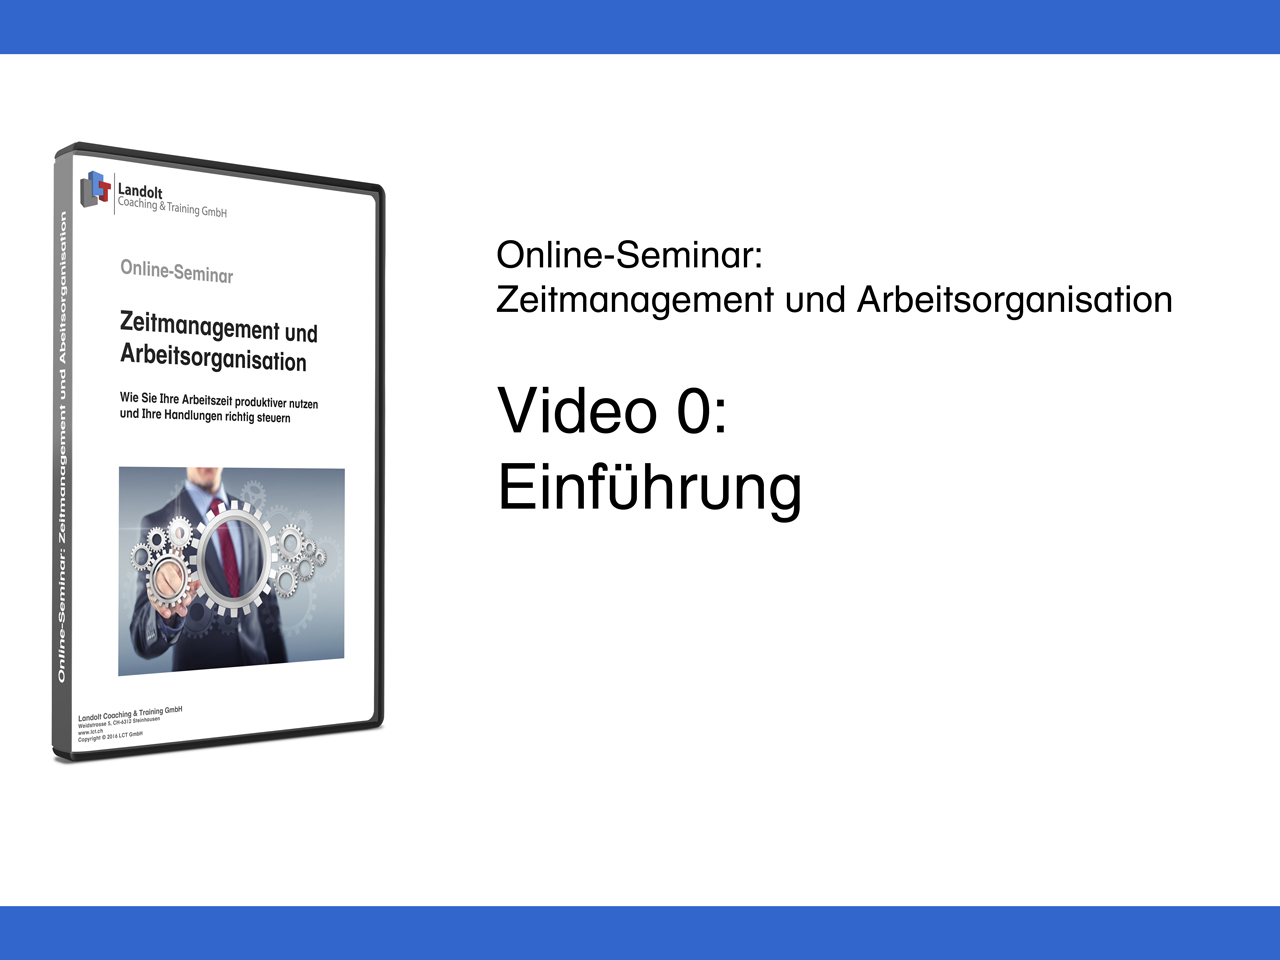 Einführung zun Online-Seminar